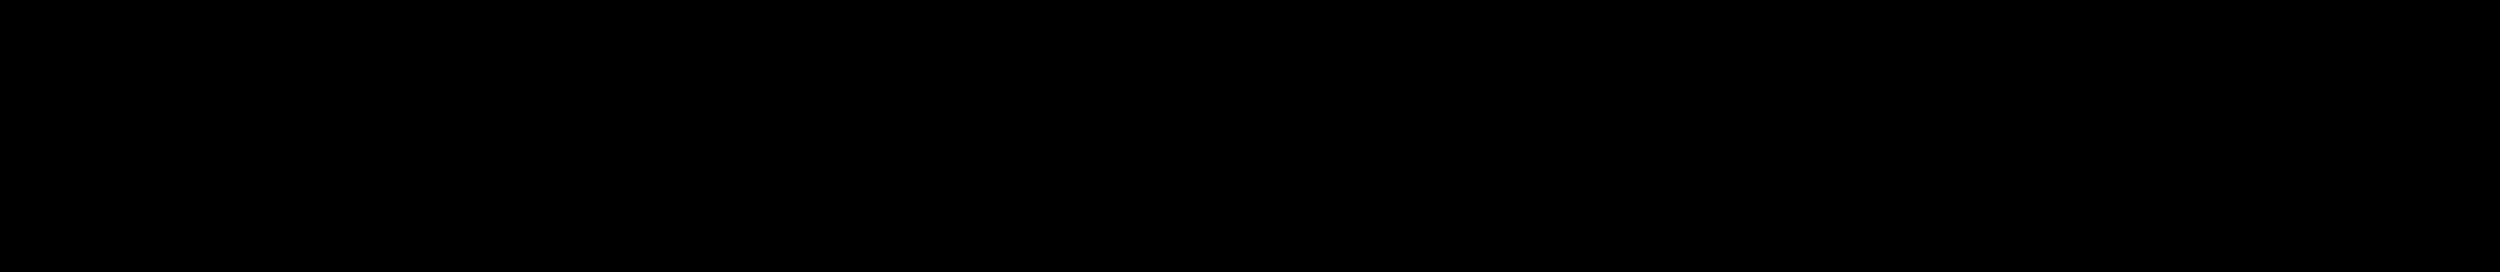 LHD_Logos_04.17.19-01.png